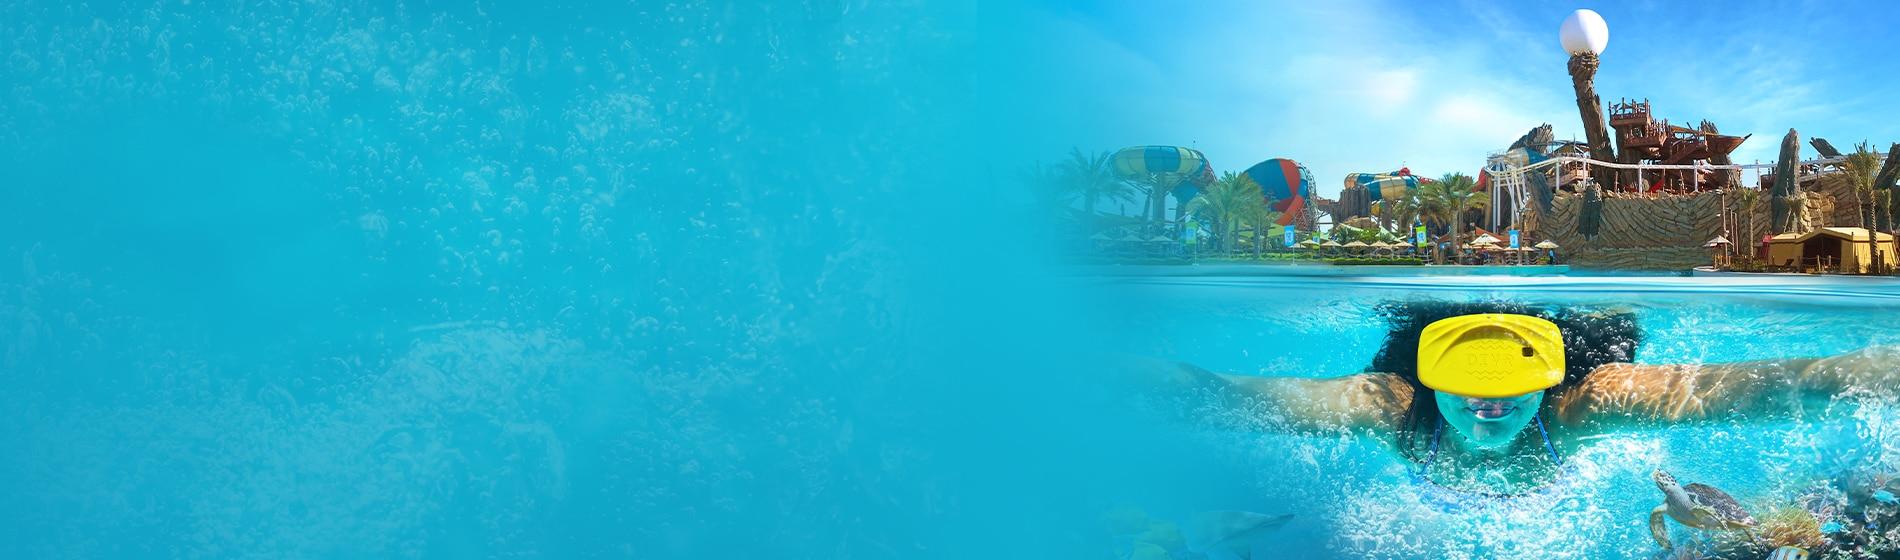 Underwater VR Experience